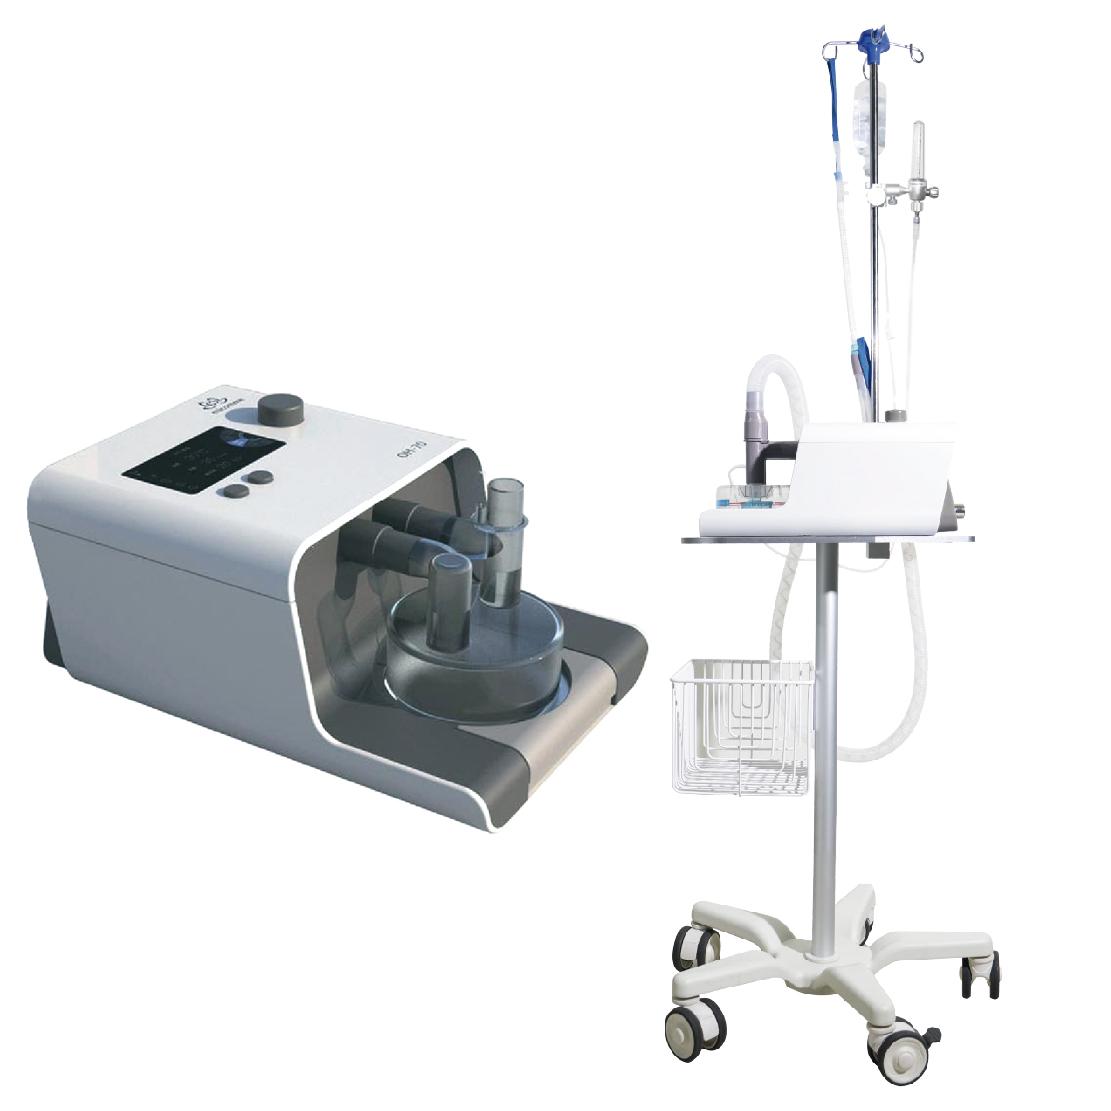 High Flow Nasal Cannula Oxygen Therapy Device Hospital ICU - KingCare | KingCare.net